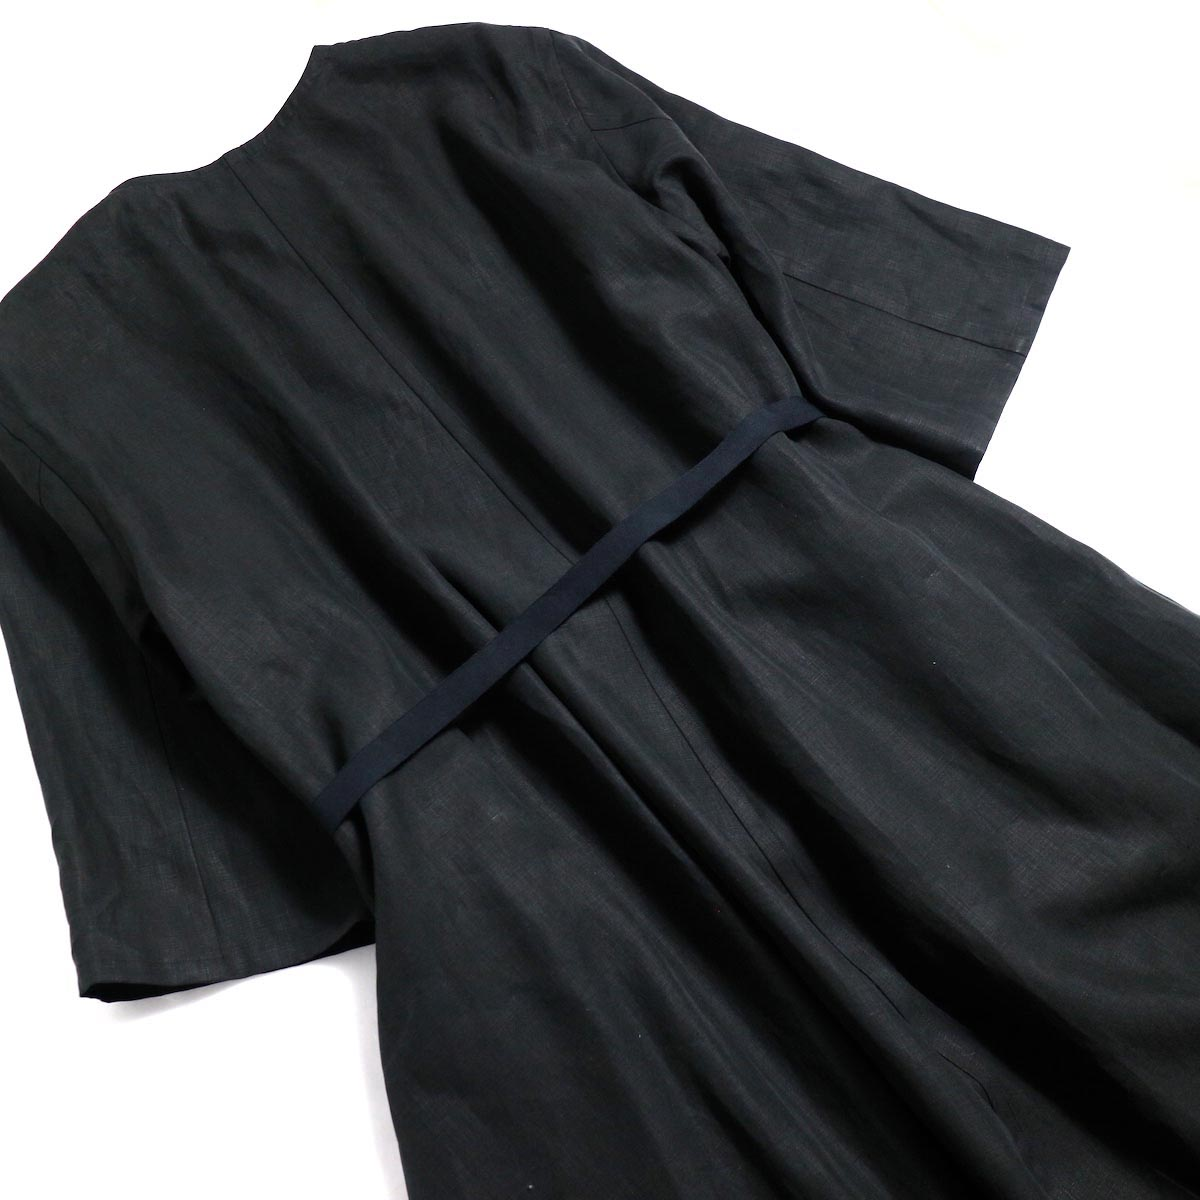 YLEVE / Linen Cotton KN CD -Black 背面ウエストベルト